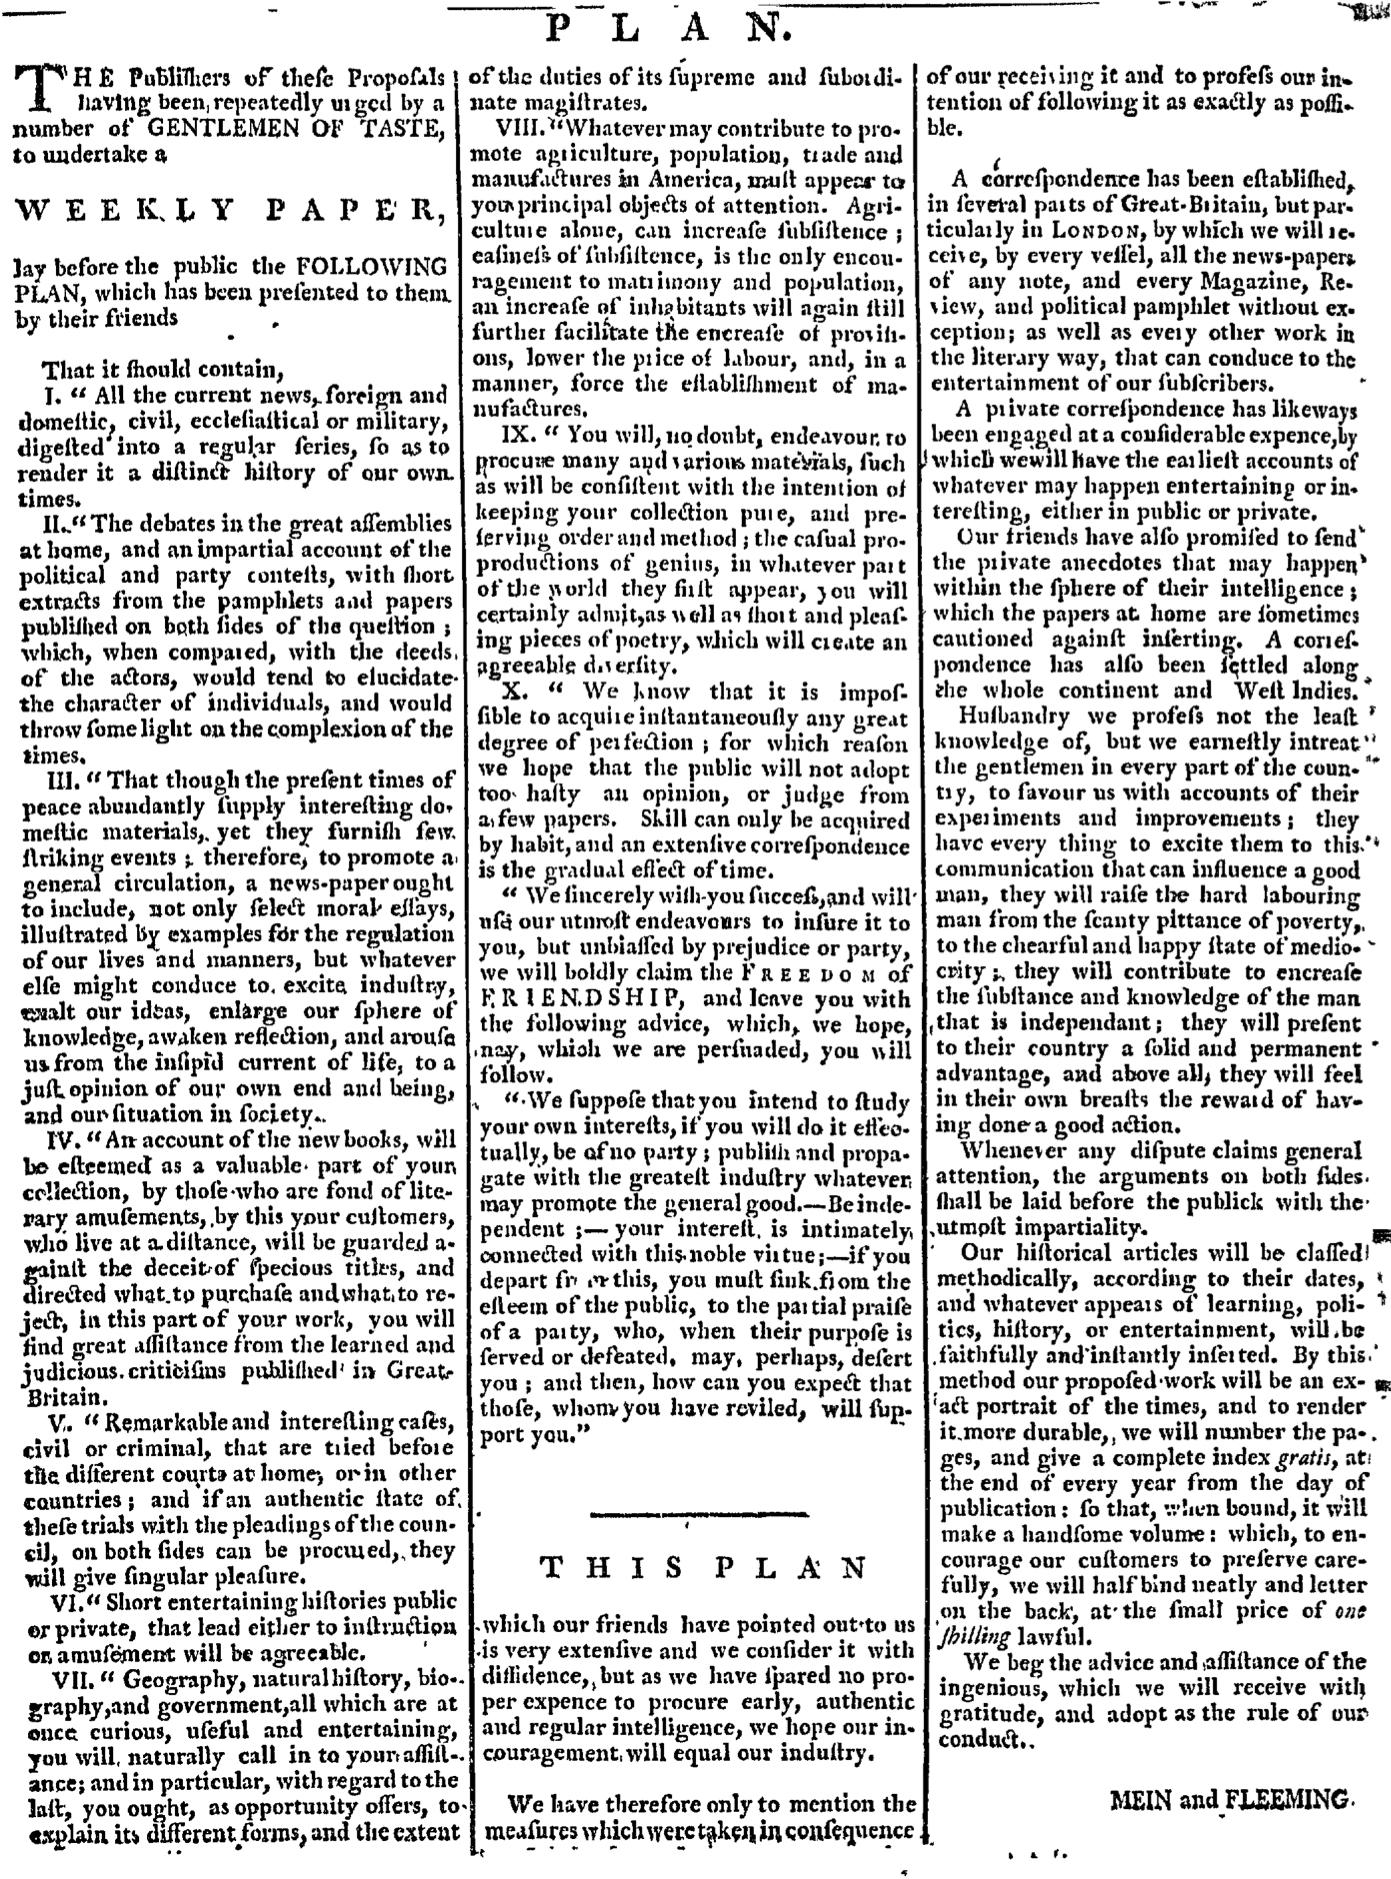 Oct 22 - 10:22:1767 Page 2 Boston Chronicle